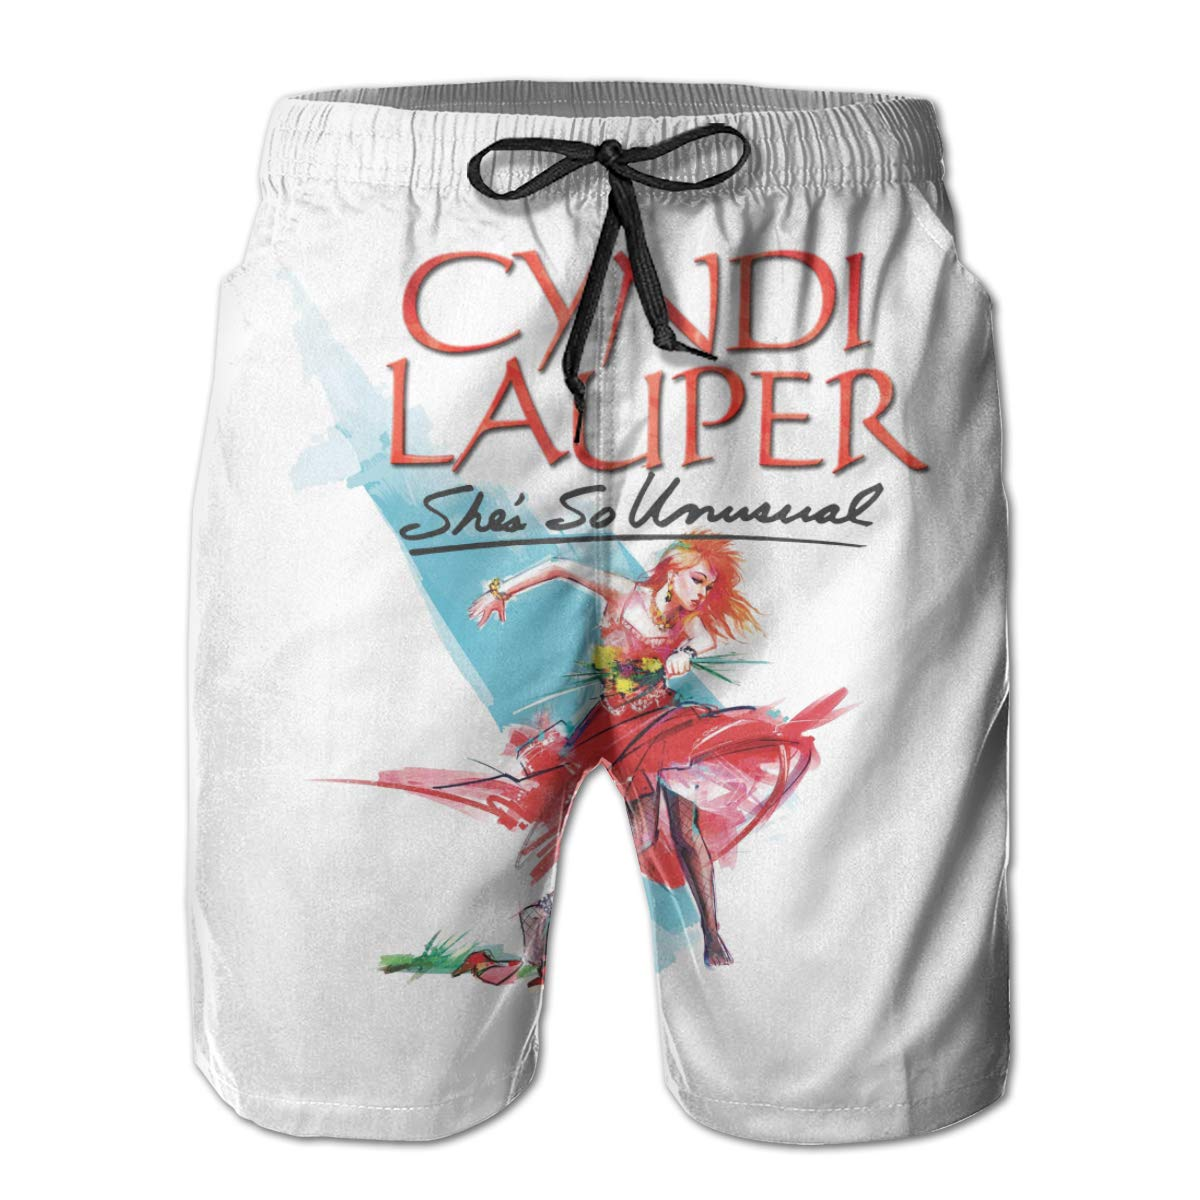 Outdoor Short Pants Beach Accessories Kurabam Beach Volleyball Shorts Cyndi Lauper Athletic Gym Shorts for Men Boys